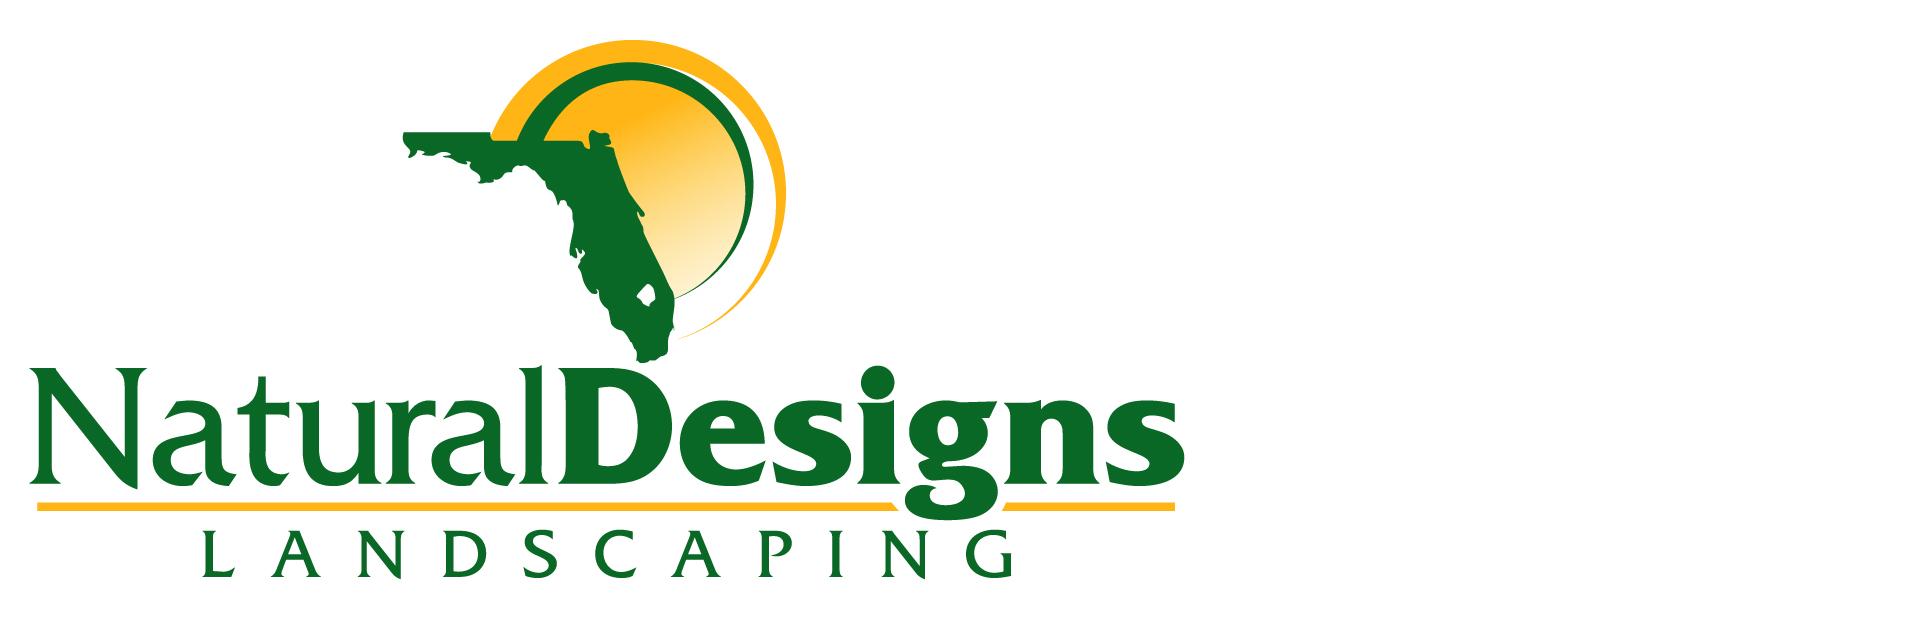 Natural Designs Landscaping Company Logo